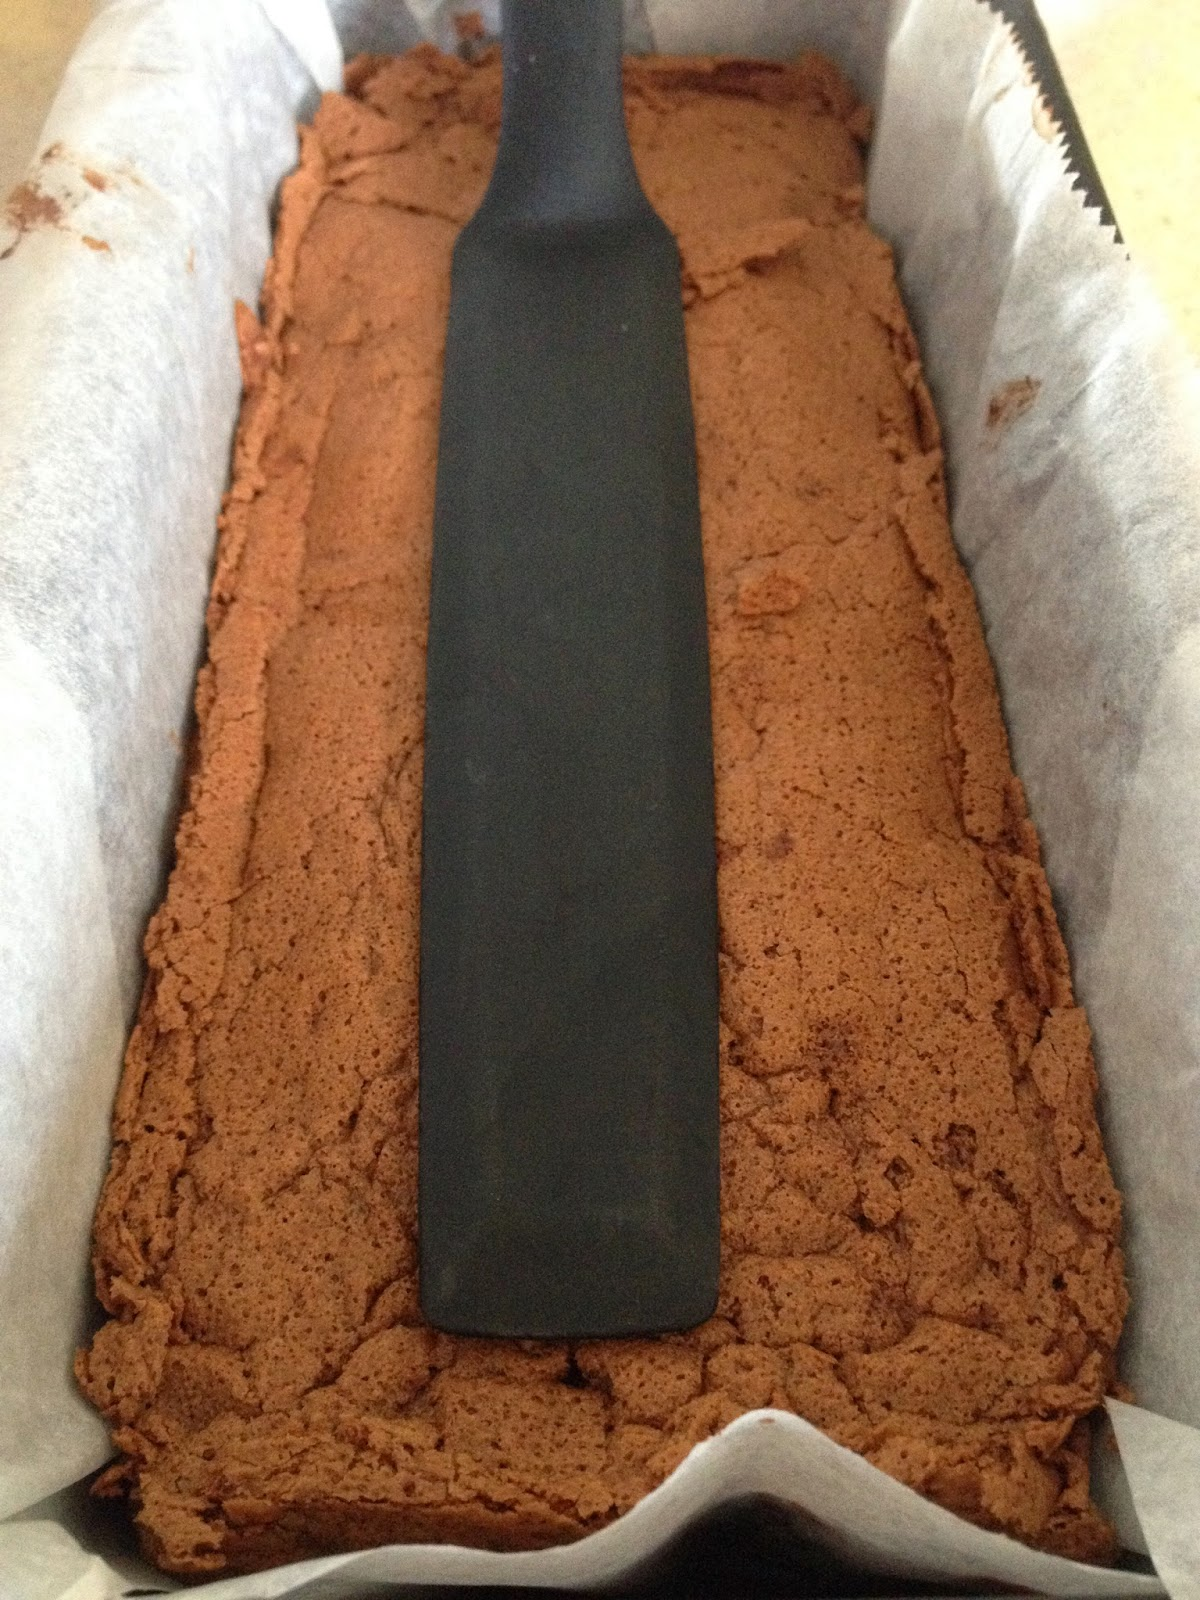 gâteau mousse au chocolat, chocolat, mousse, cuit, cru, raw food, sans gluten,  gluten free, valrhona, easter, pâques